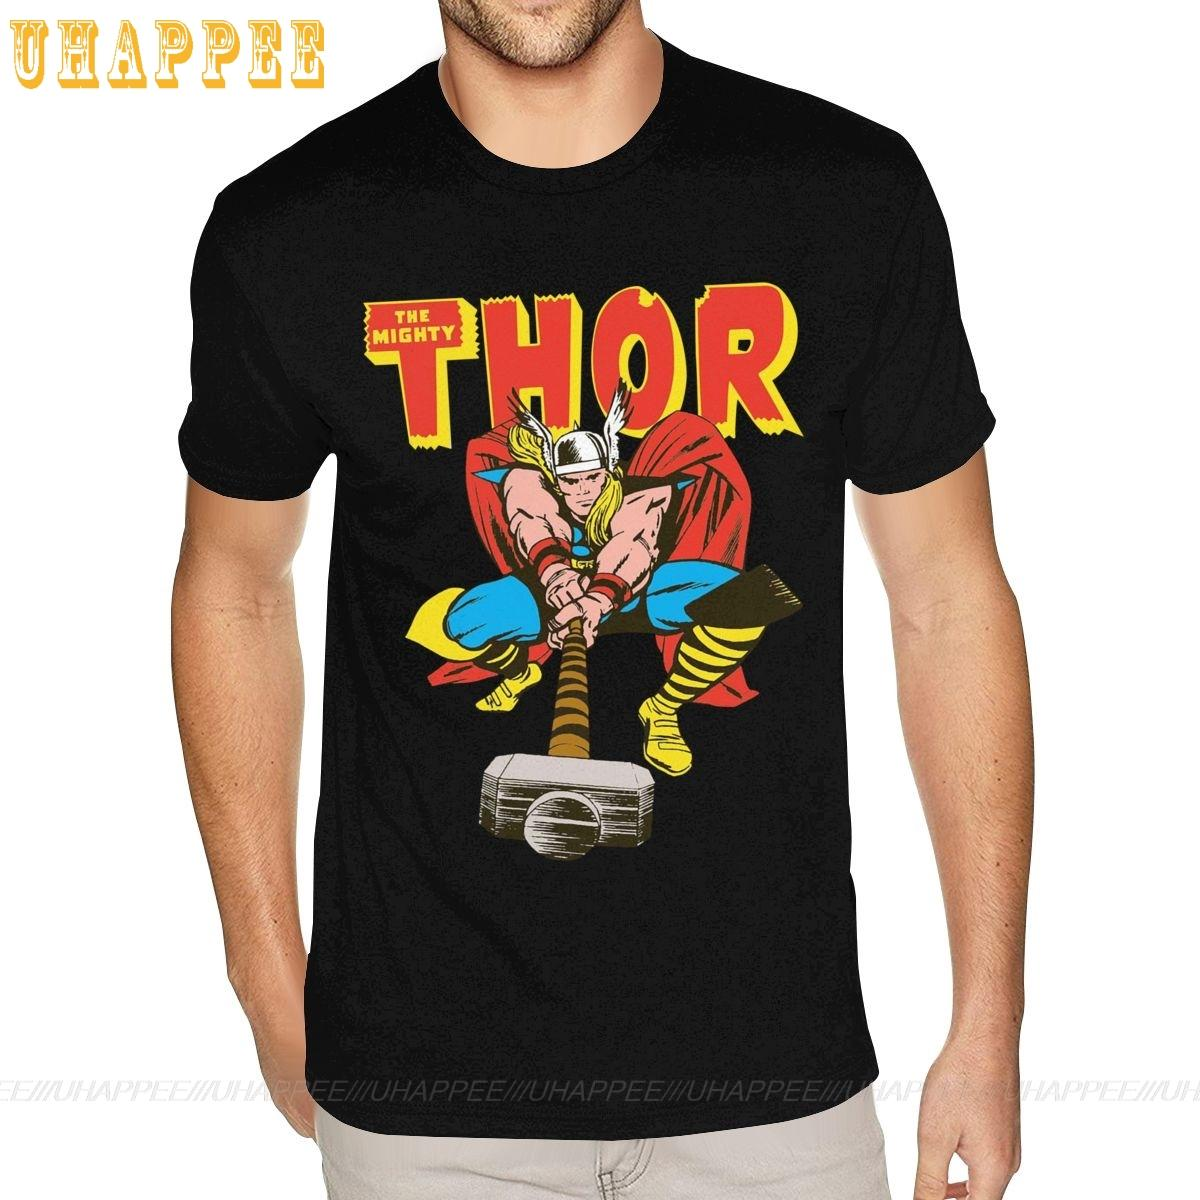 Anime Thor Ragnarok Tees Shirt Small Size For Men Cotton Cotton T-shirt